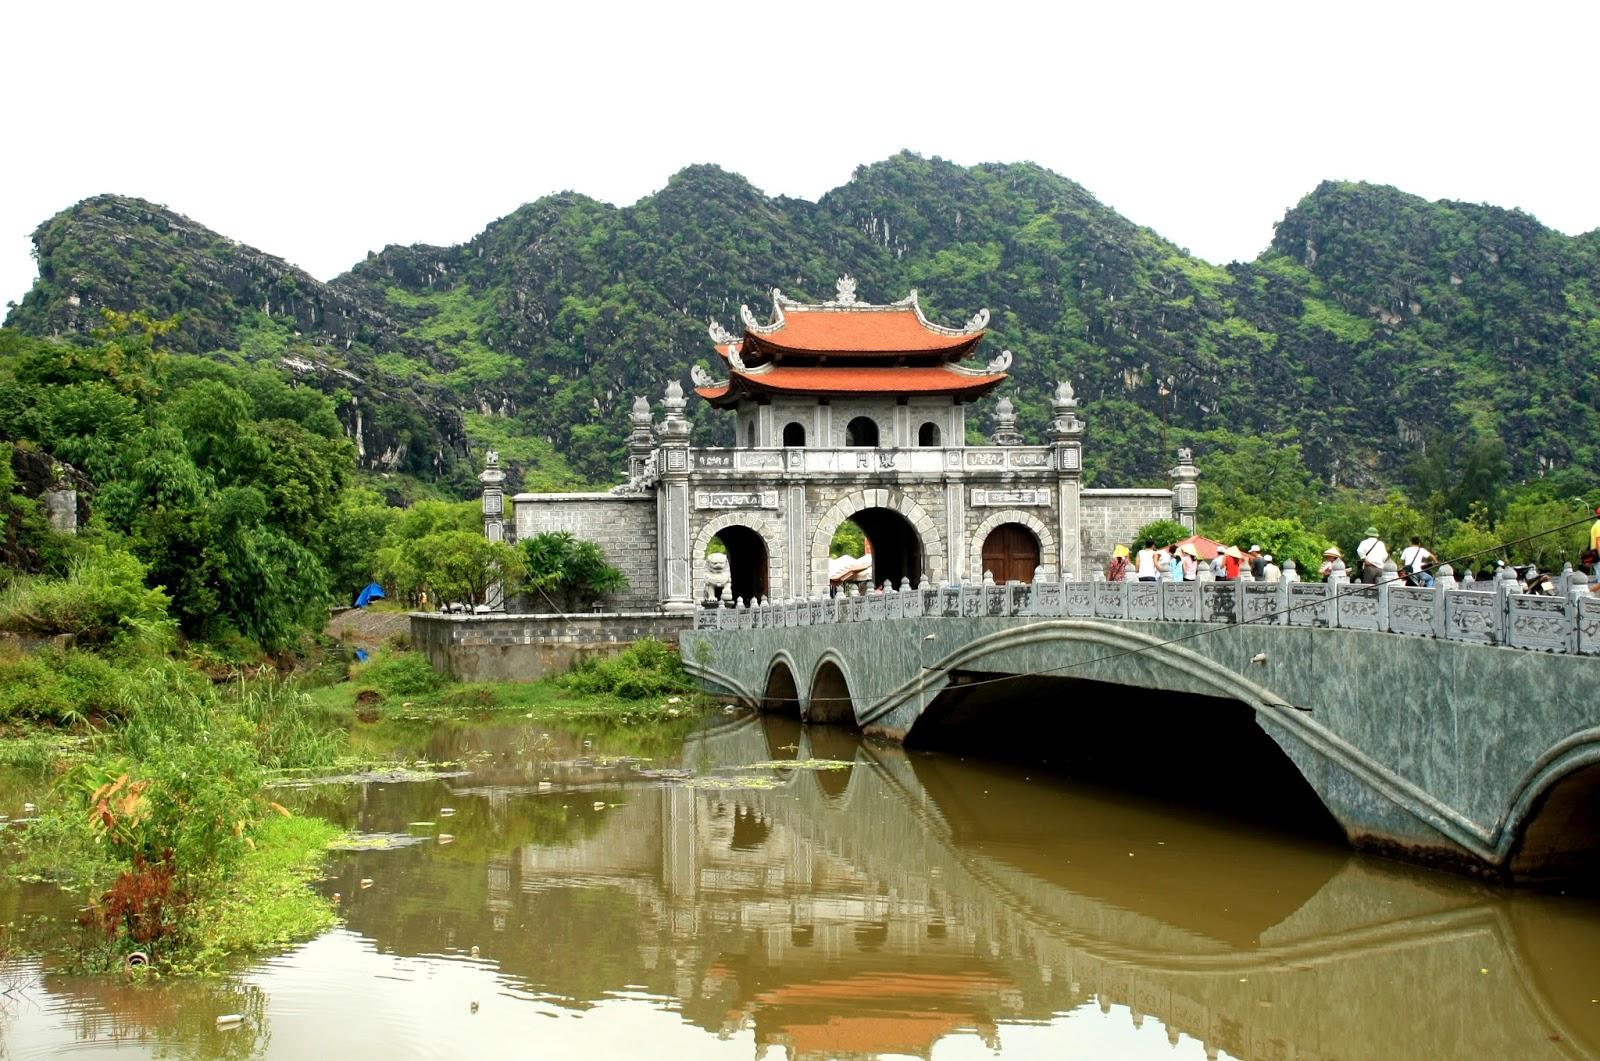 Photo: Hanoi Explorer Travel